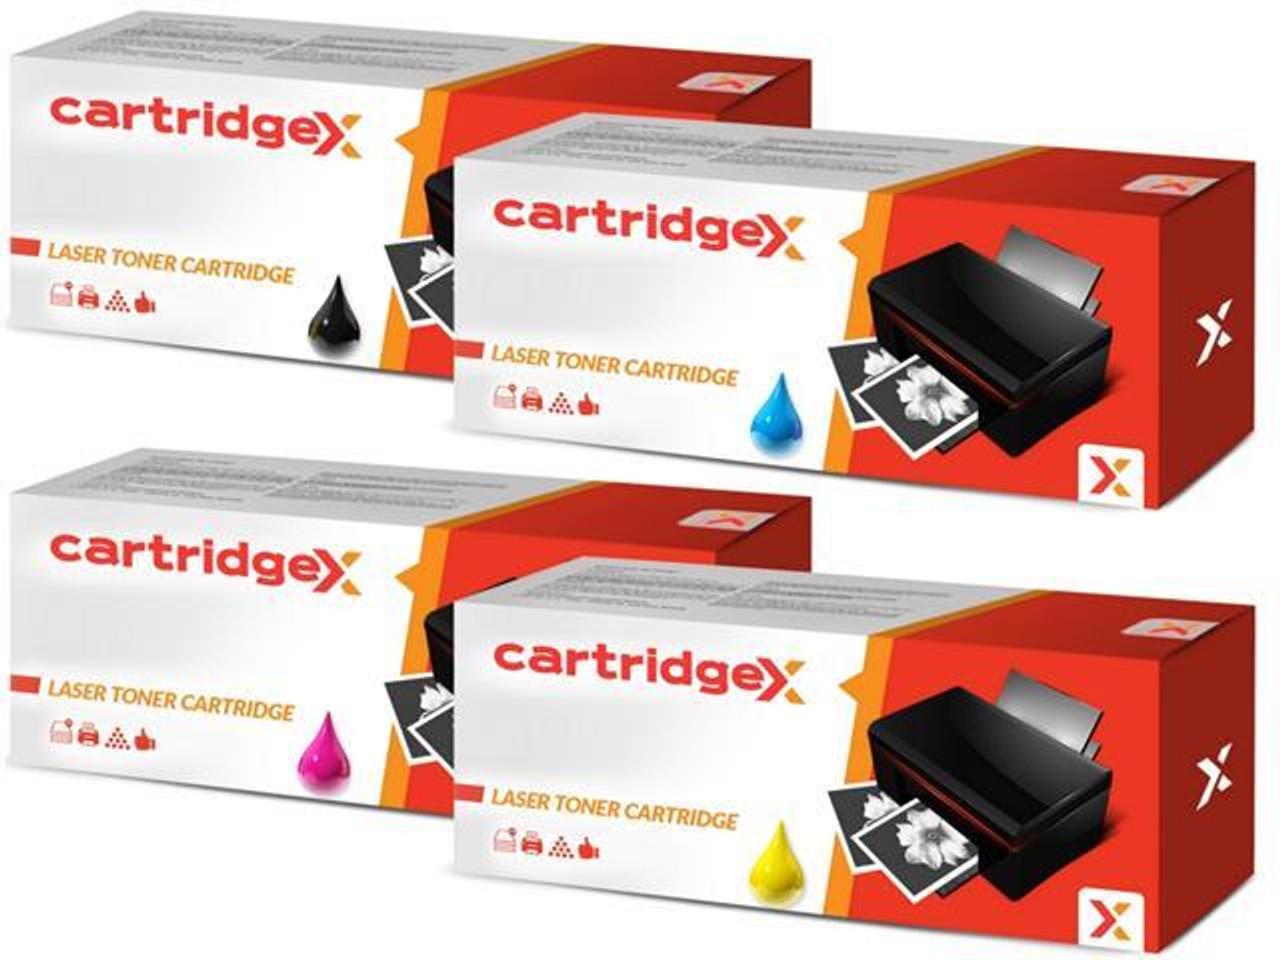 Compatible 4 Colour Epson S05055 Toner Cartridge Multipack (Replacement For Epson C13s050557/6/5/4)